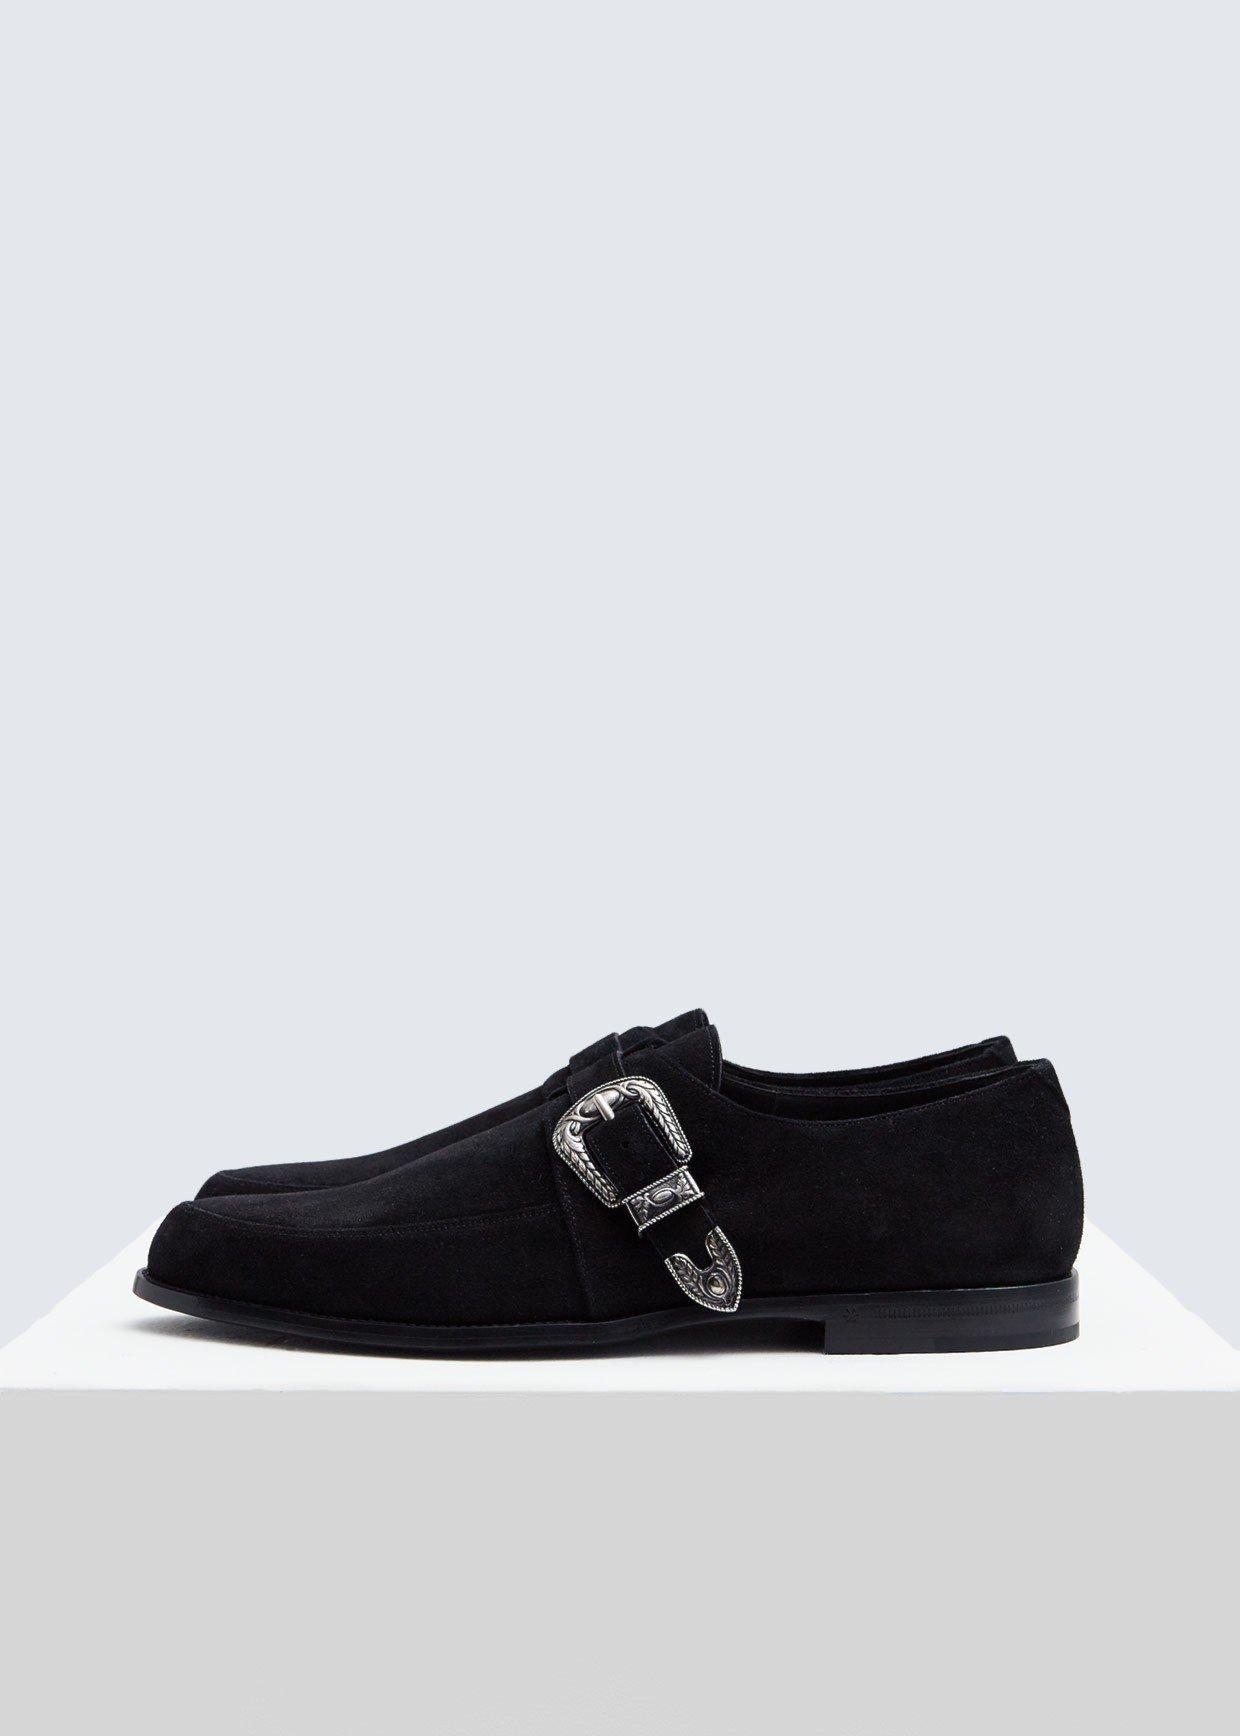 f2443a90468 Lyst - Saint Laurent Charles Monkstrap Shoe in Black for Men